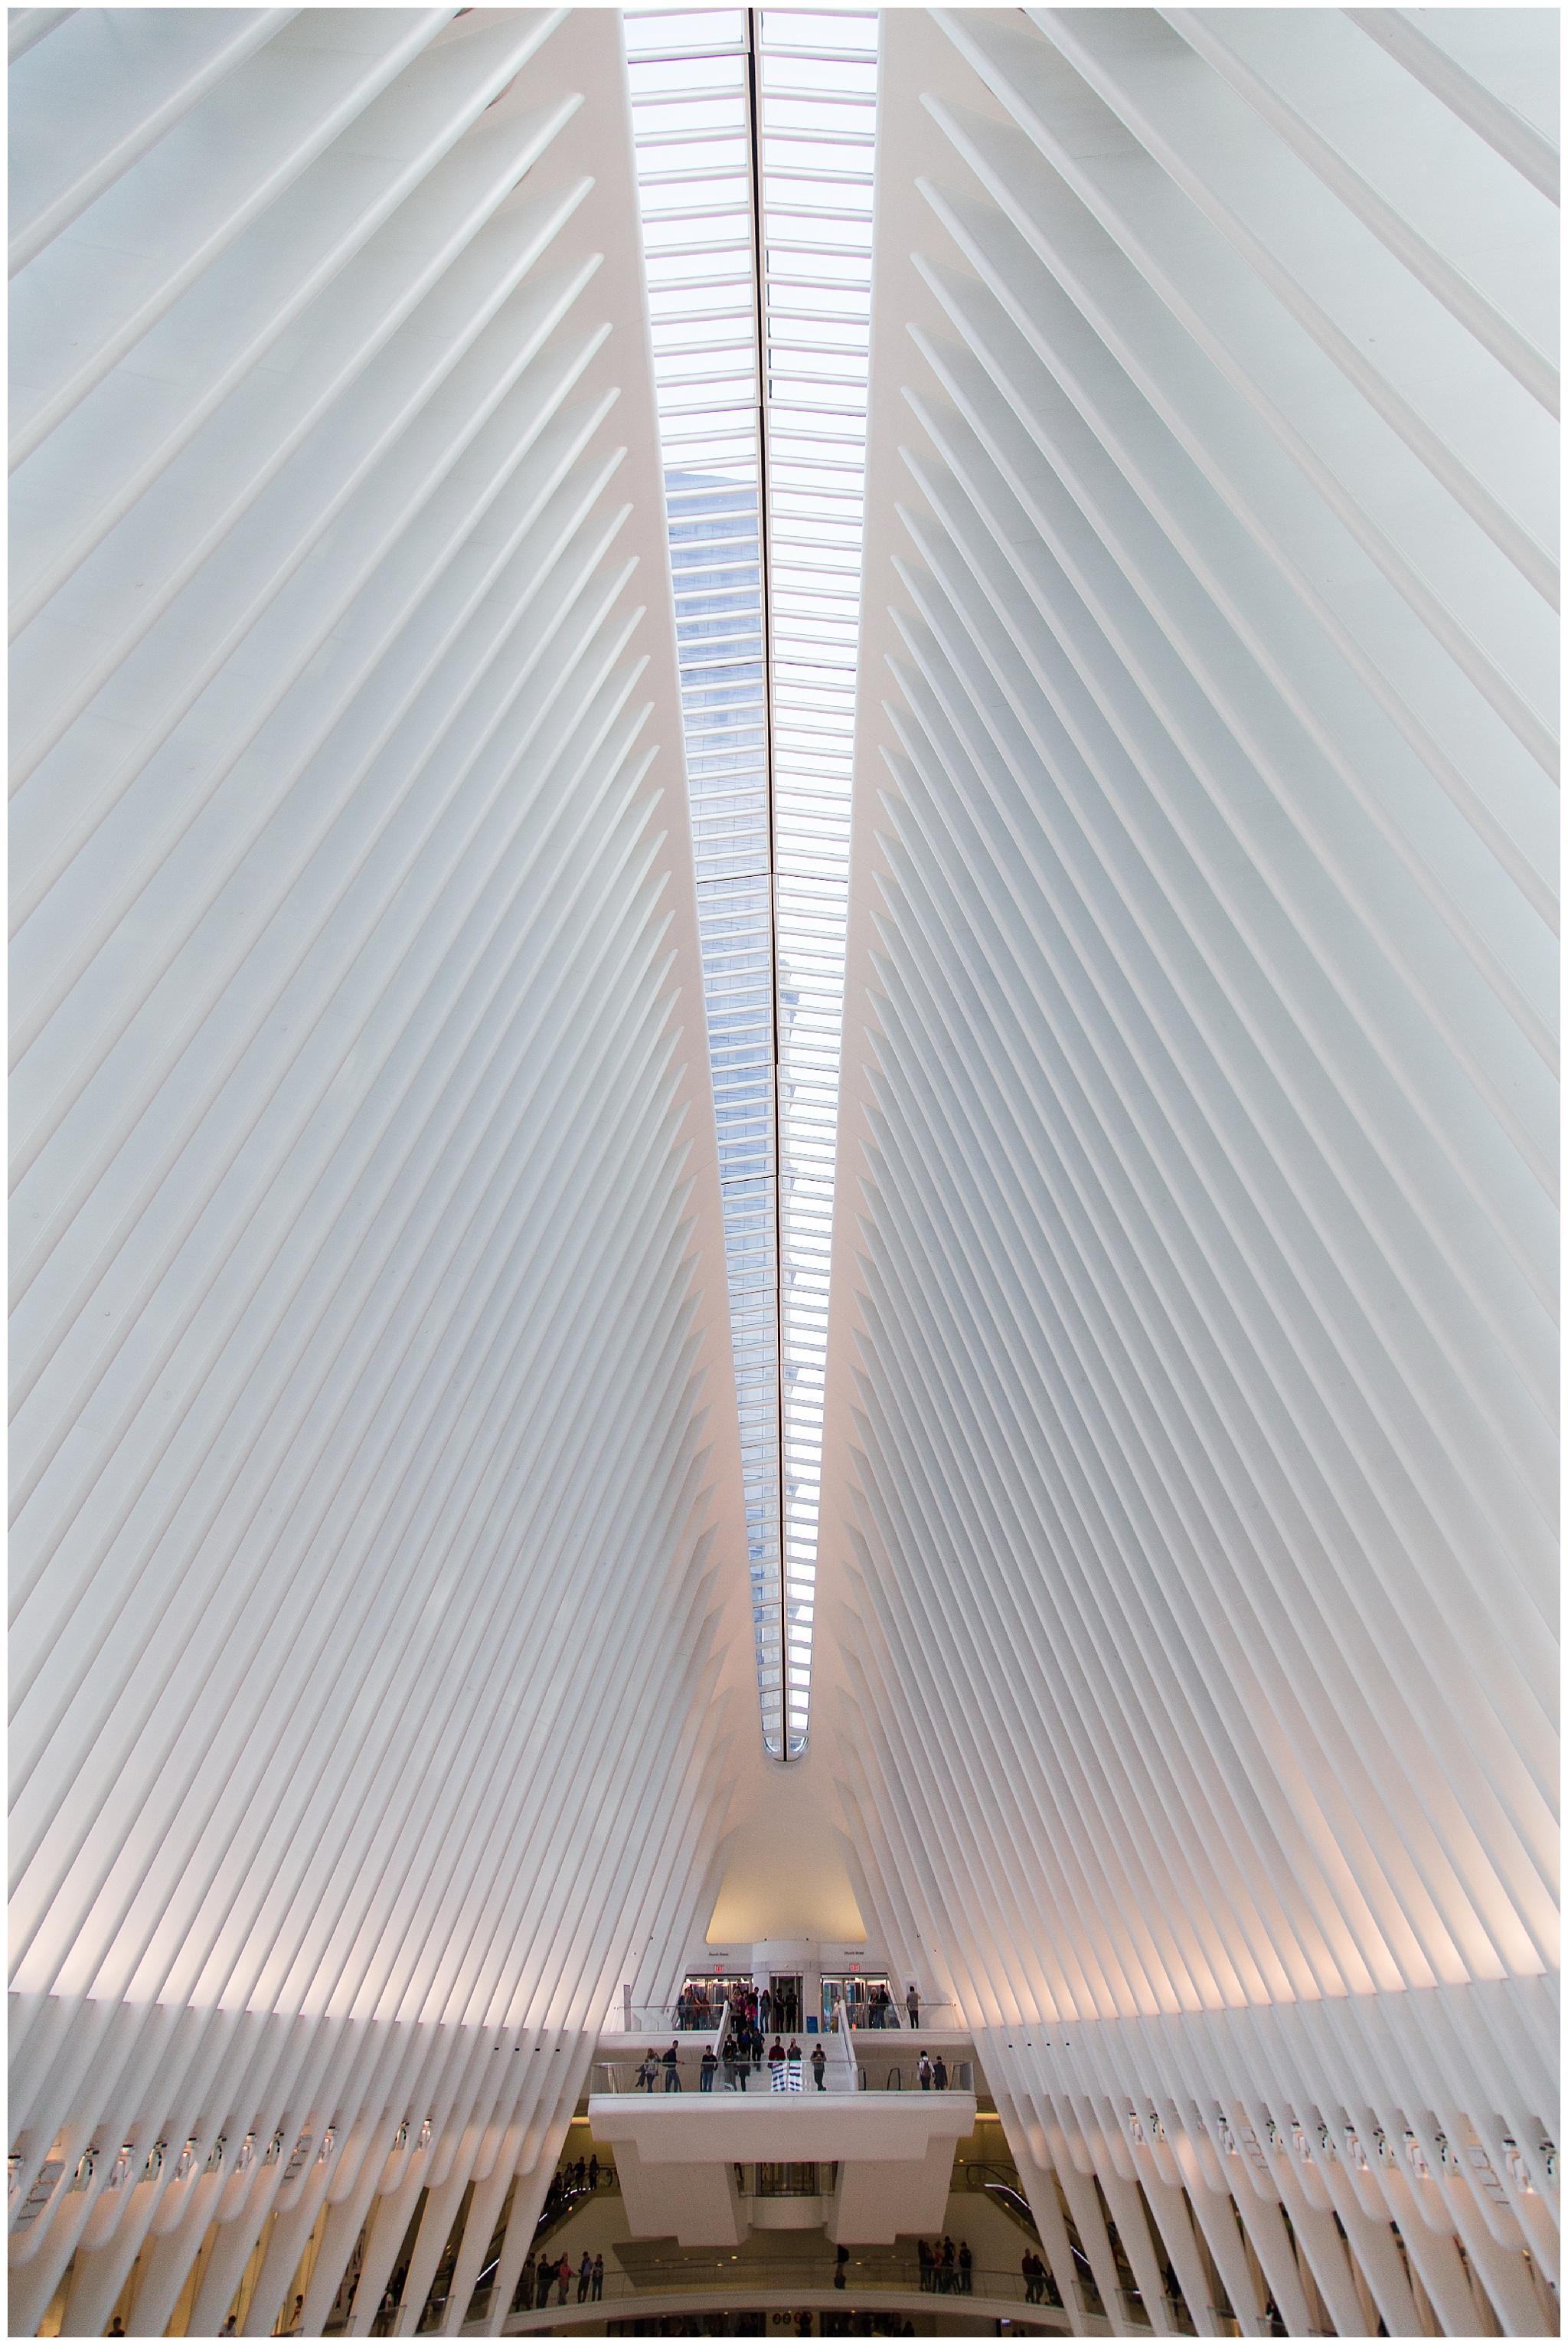 NYC_0018.jpg